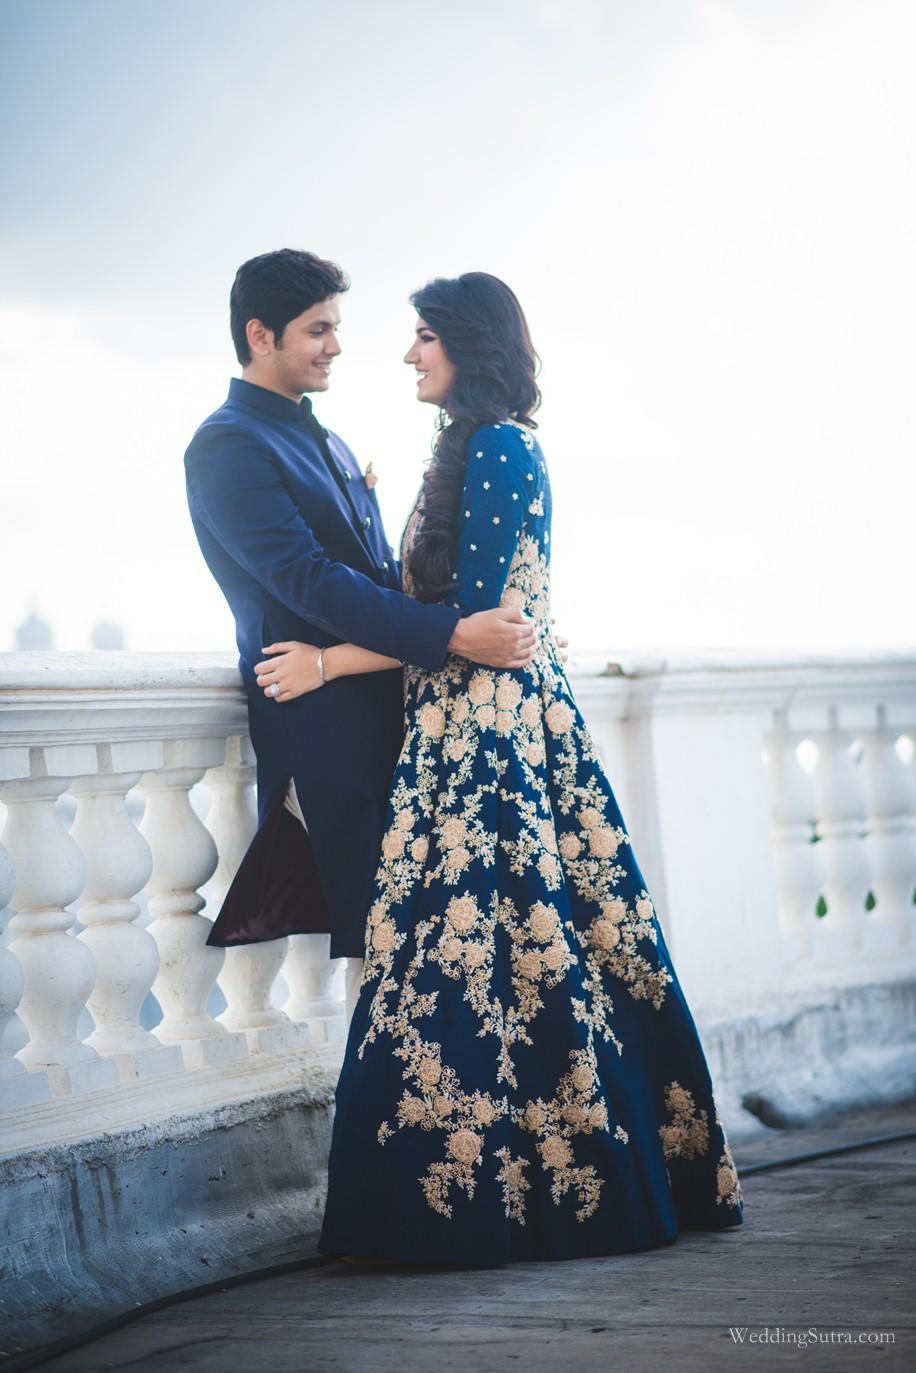 WeddingSutra_AnamMirza+AkbarRasheed (8)